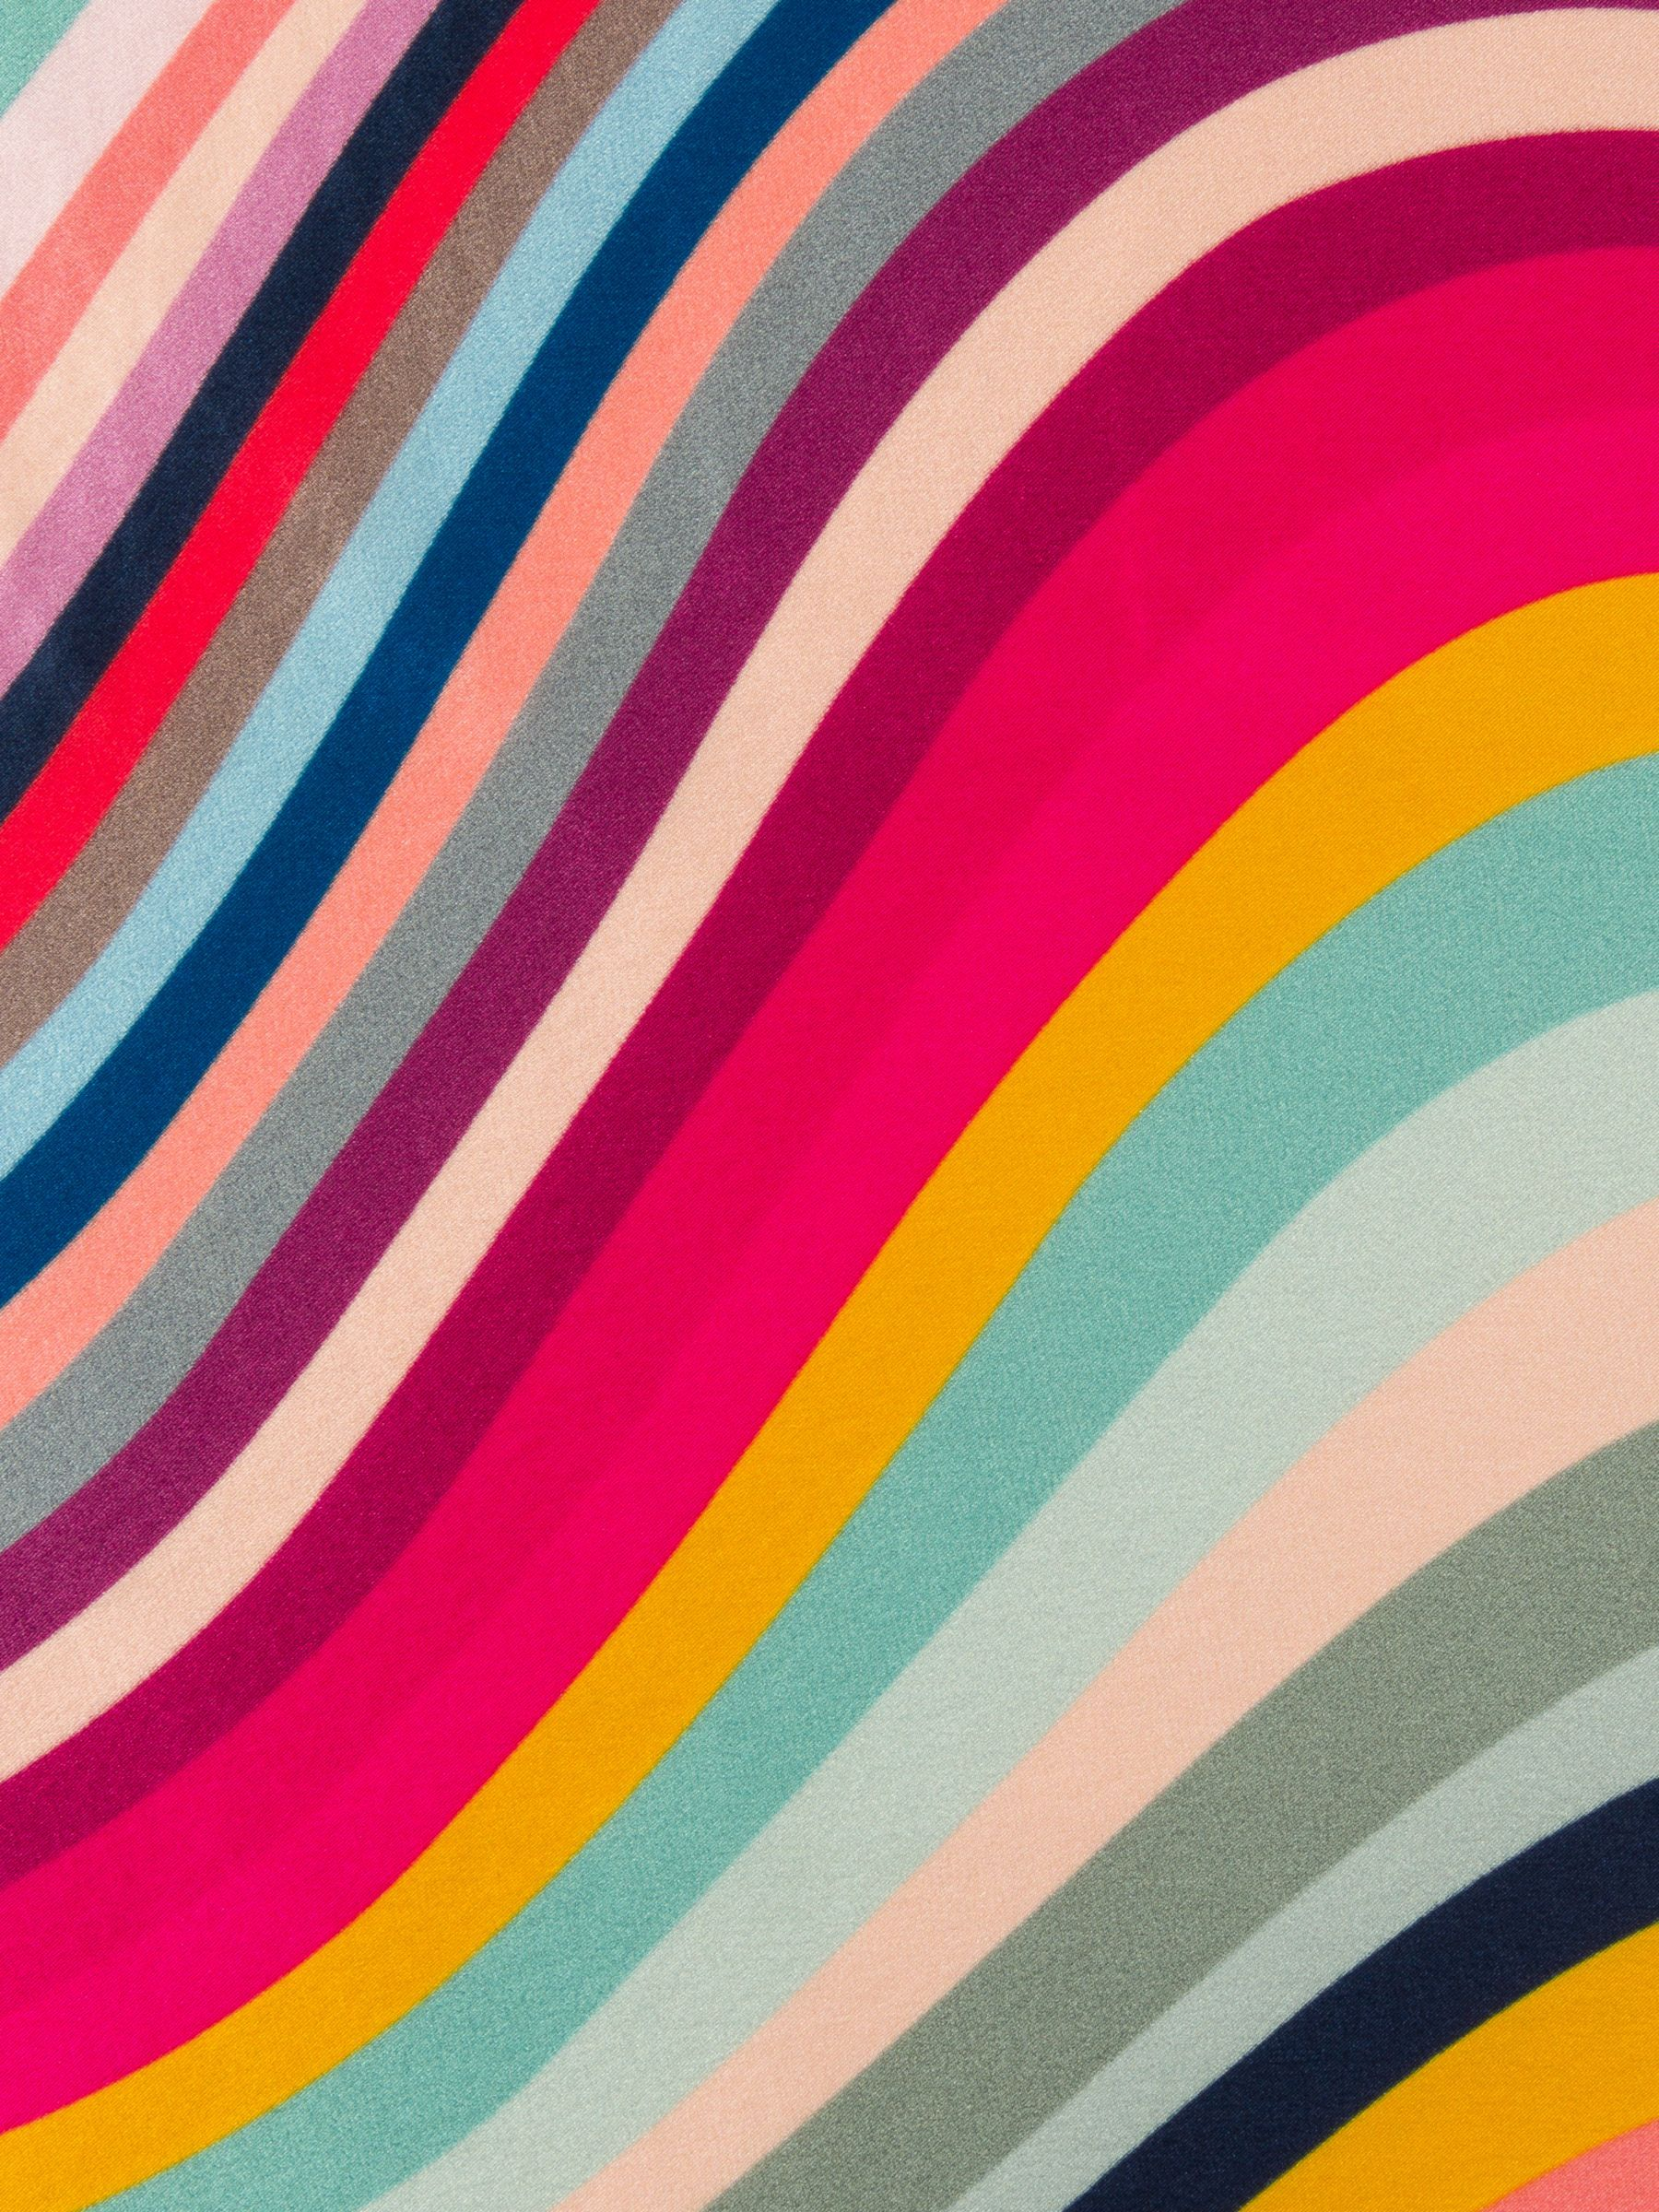 Paul Smith Large Swirl Stripe Silk Scarf Multi In 2020